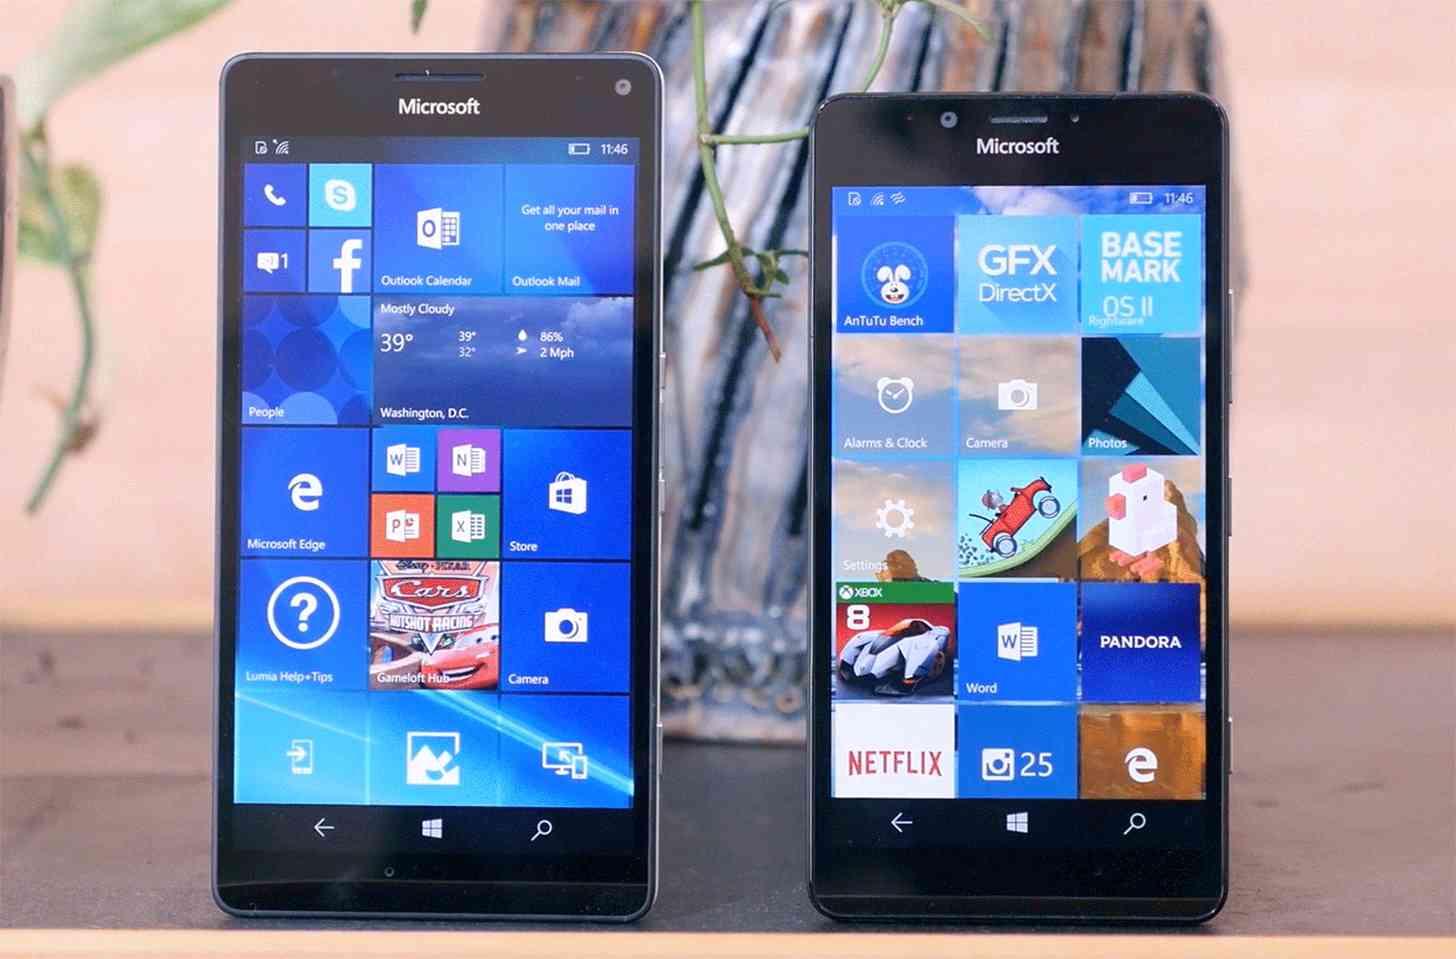 Microsoft Lumia 950, Lumia 950 XL review